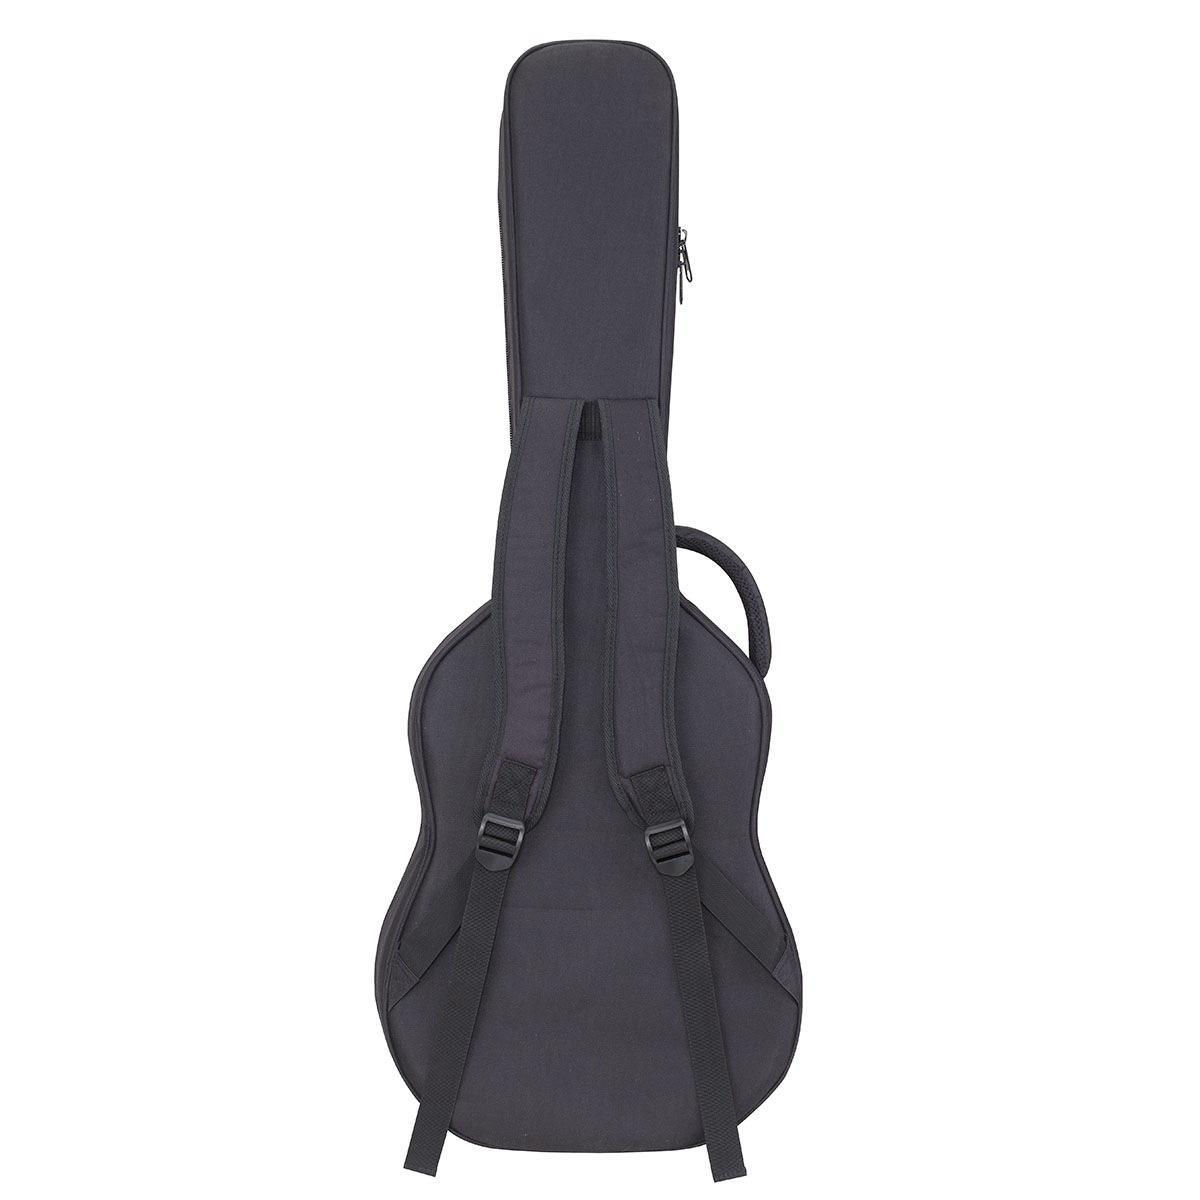 Soundsation sfc-a custodia chitarra acustica